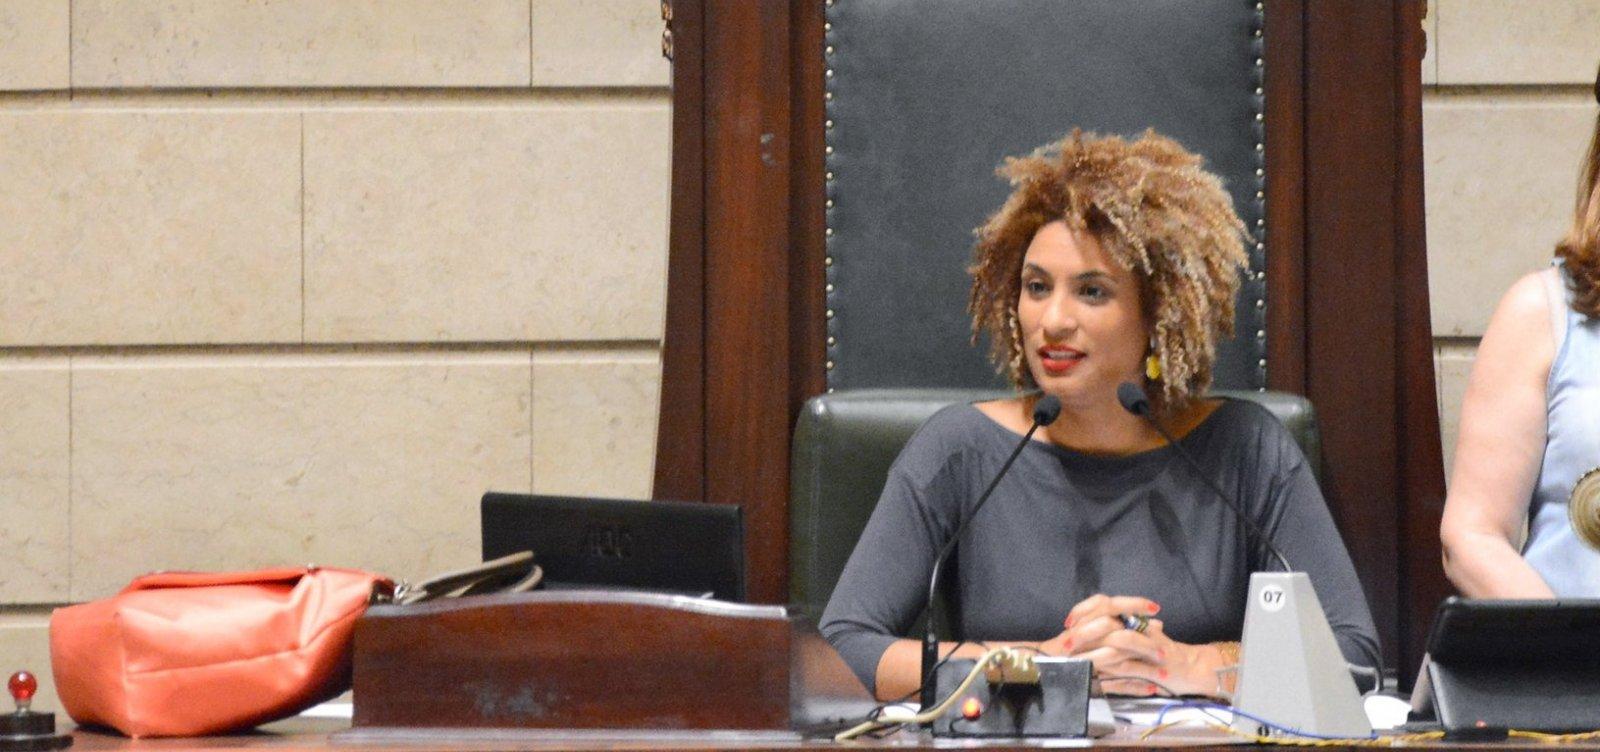 Caso Marielle: Polícia Civil volta a ouvir assessores de Carlos Bolsonaro